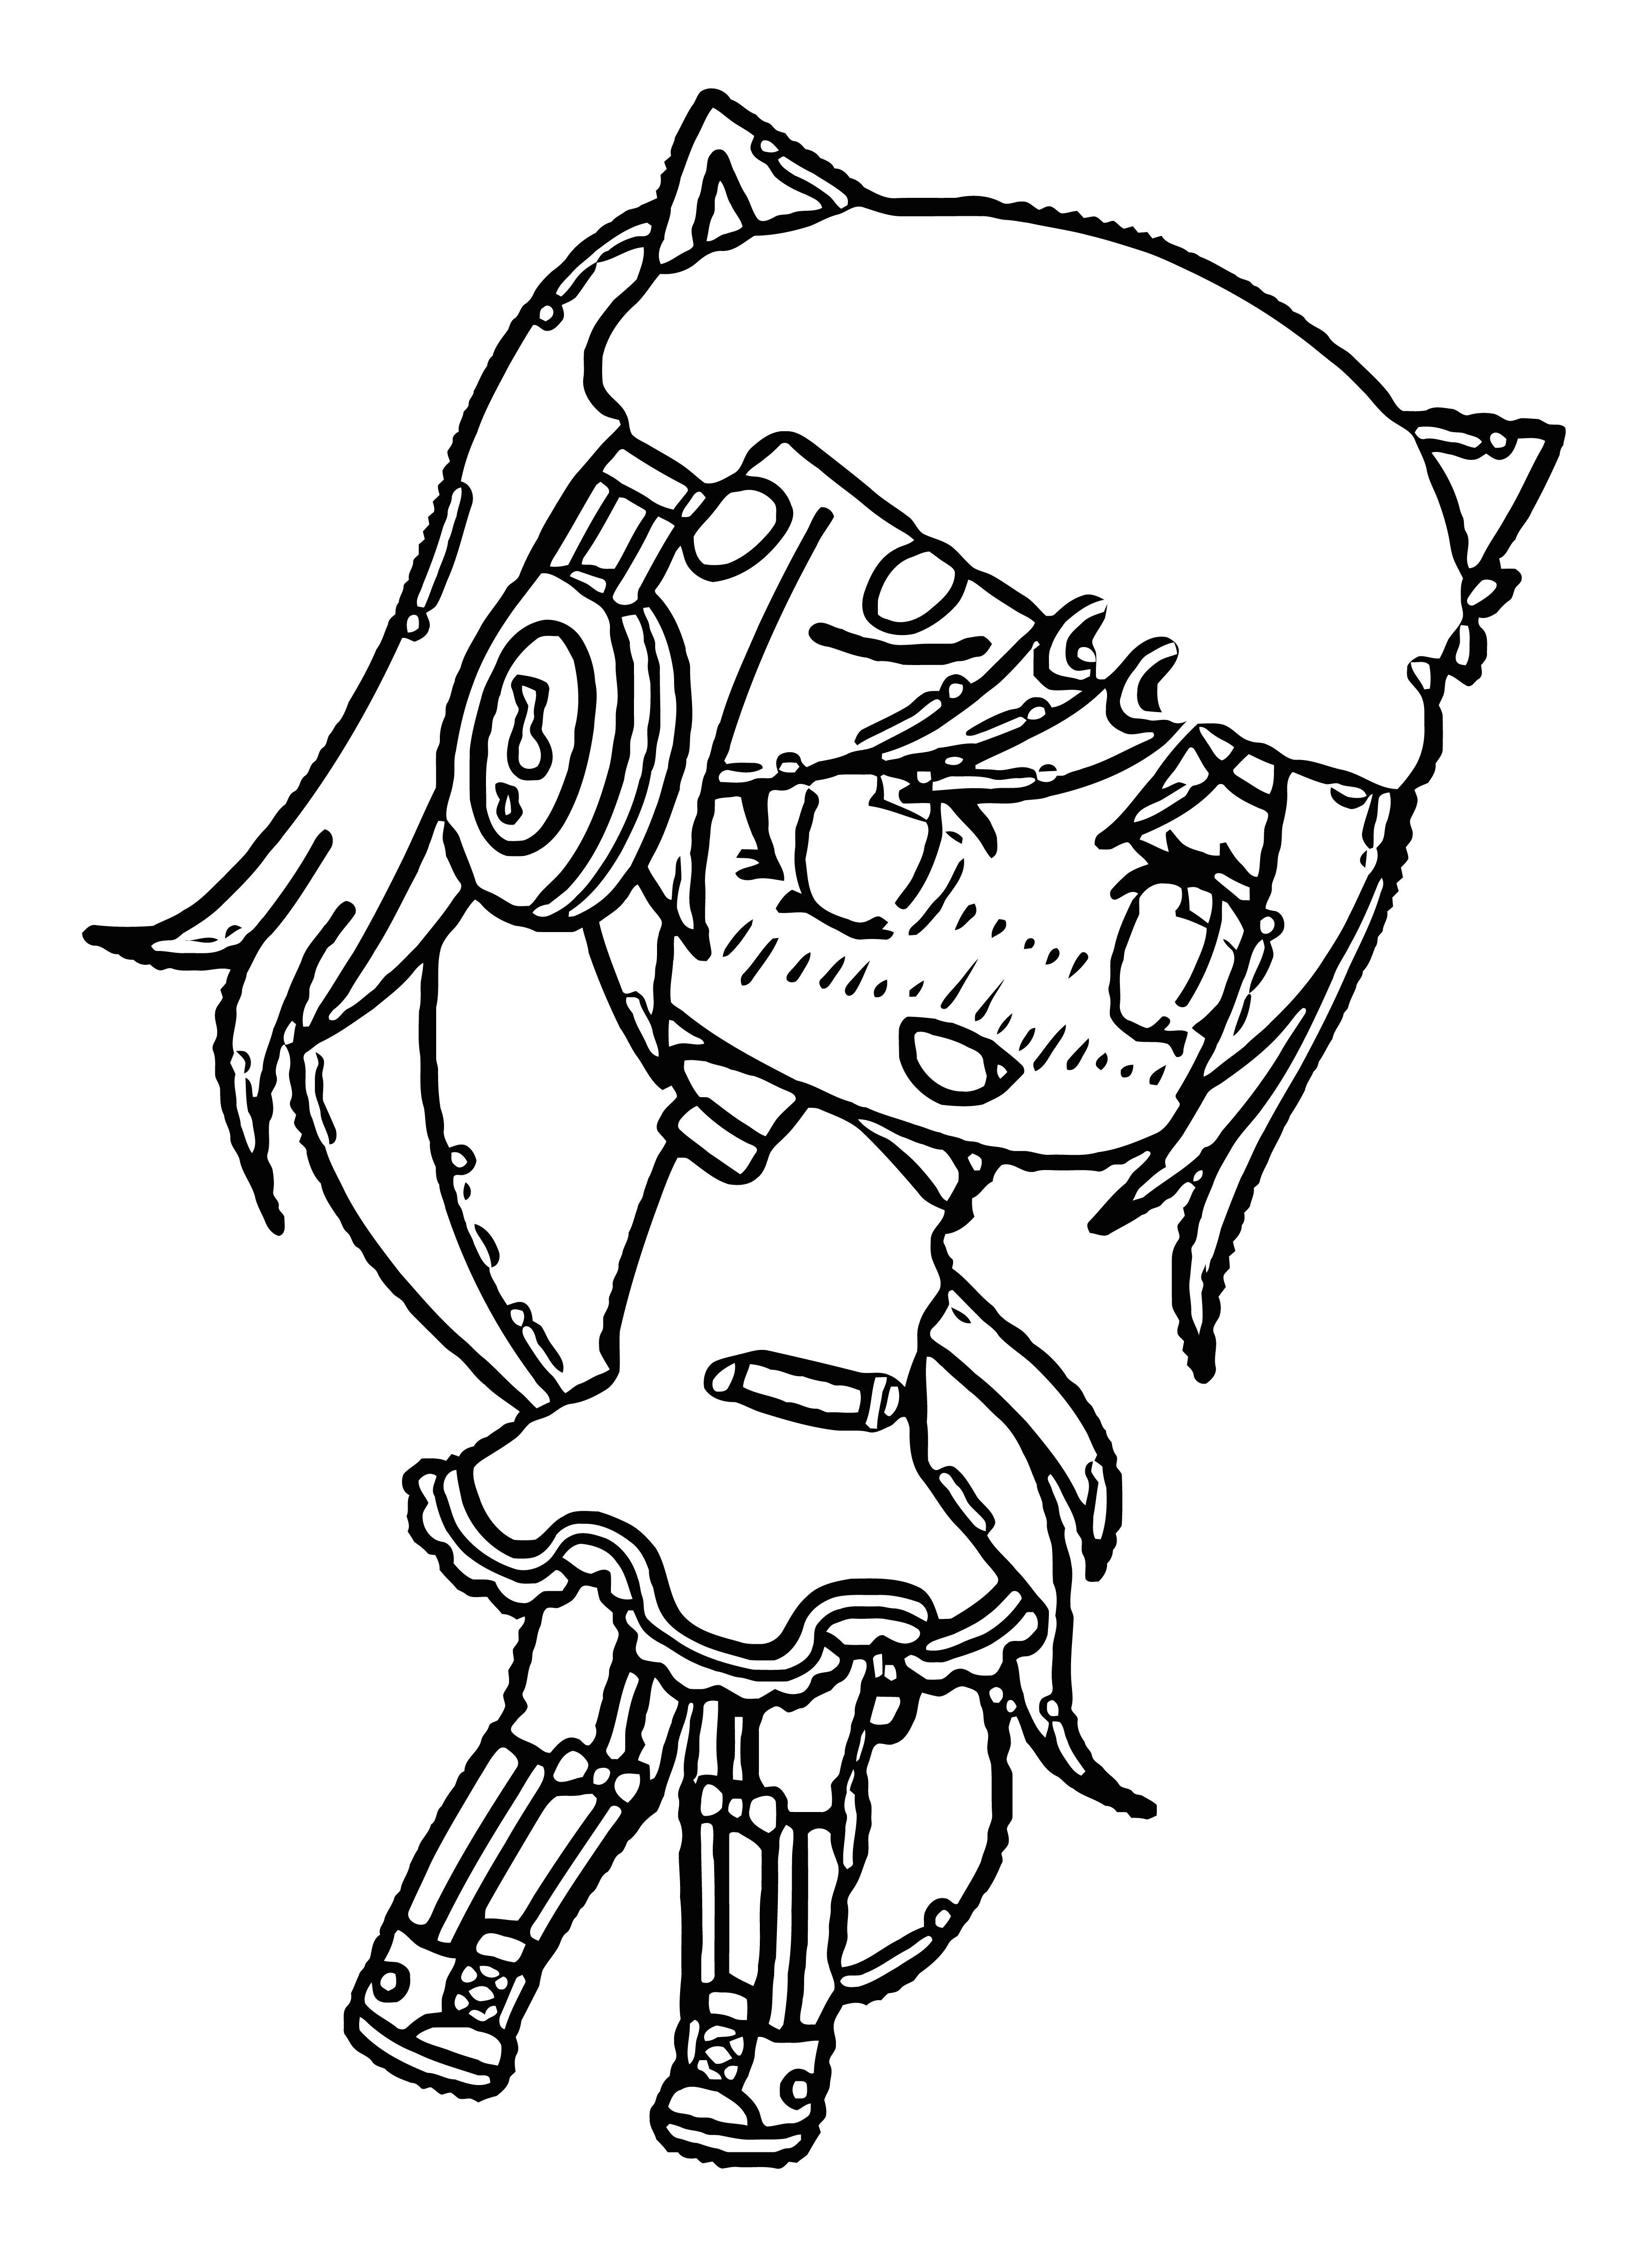 Gacha Life Characters Girl Hd Download Coloring Page